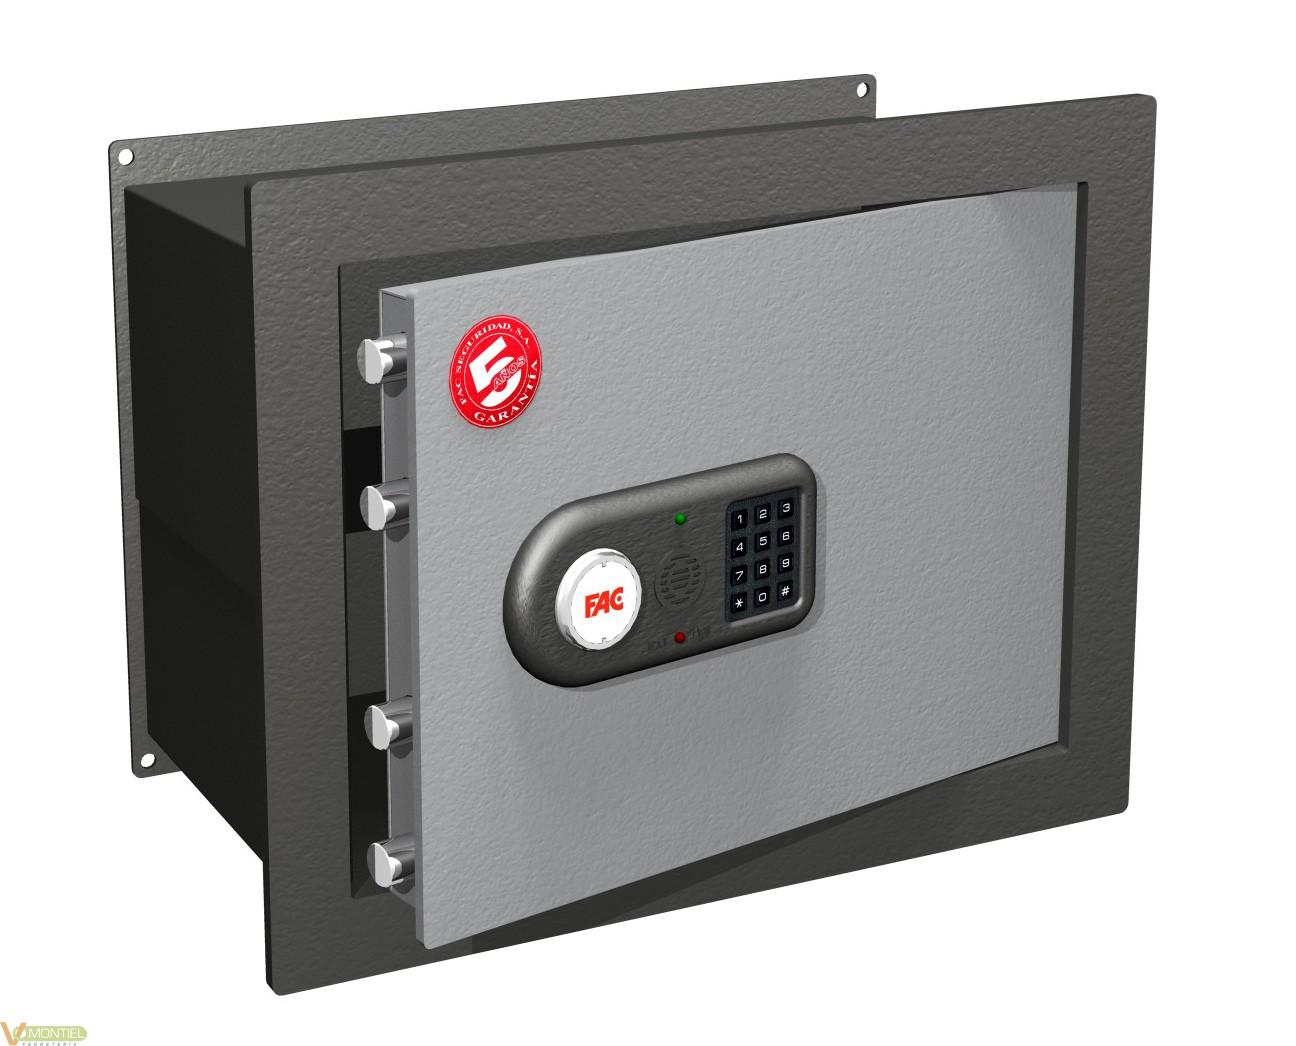 Caja fuerte emp 380x485x220mm-0